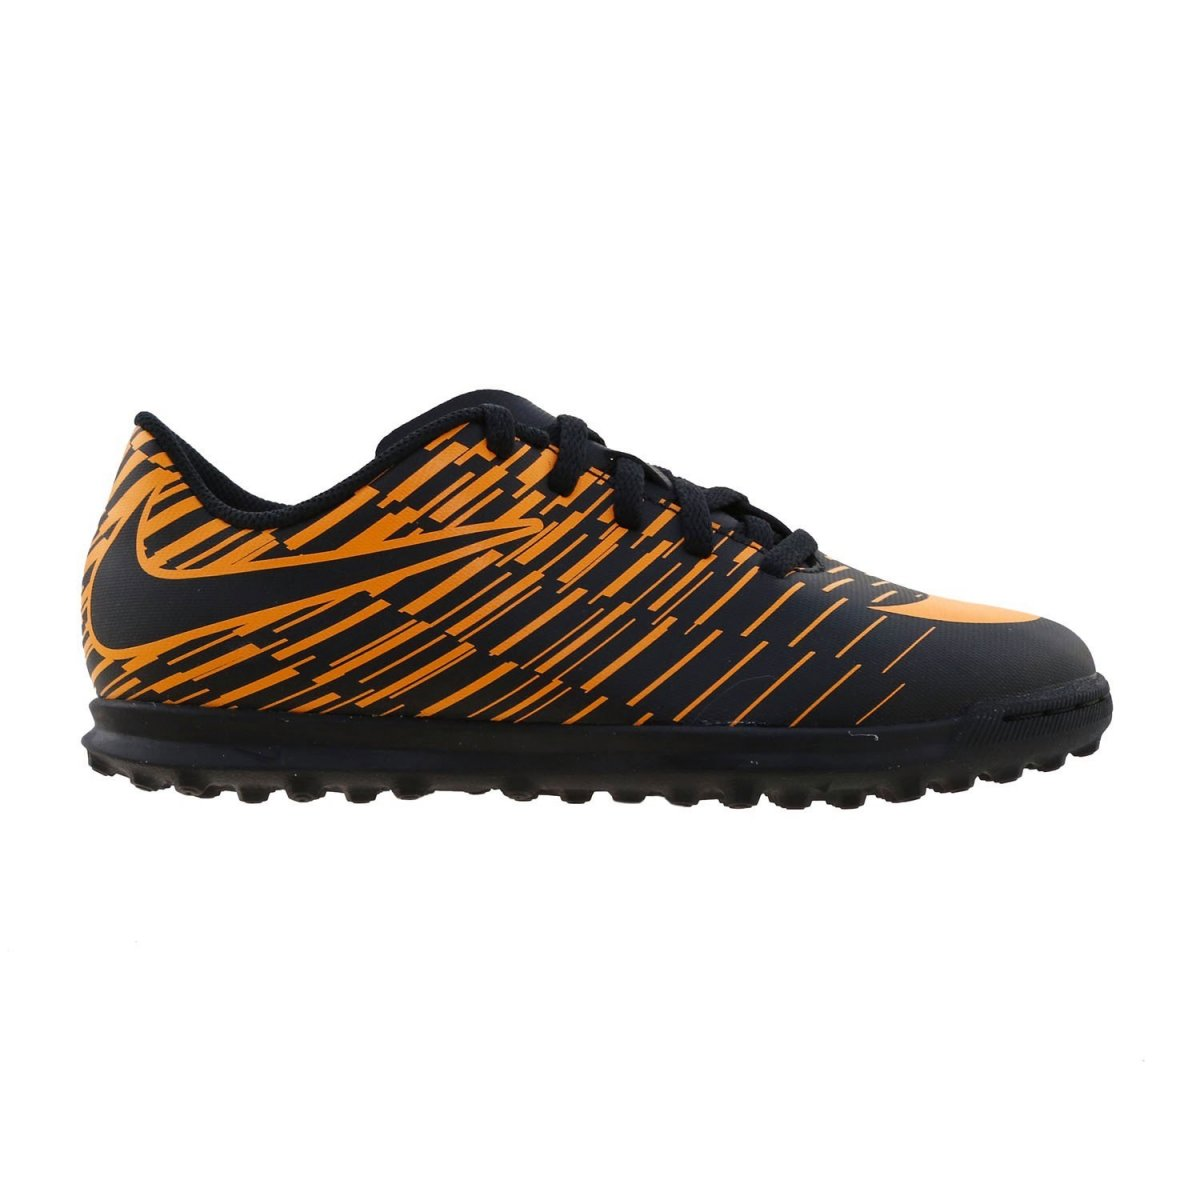 Chuteira Infantil Society Nike Bravatax II TF 844440-002 Preto Laranja b37c176898ed9